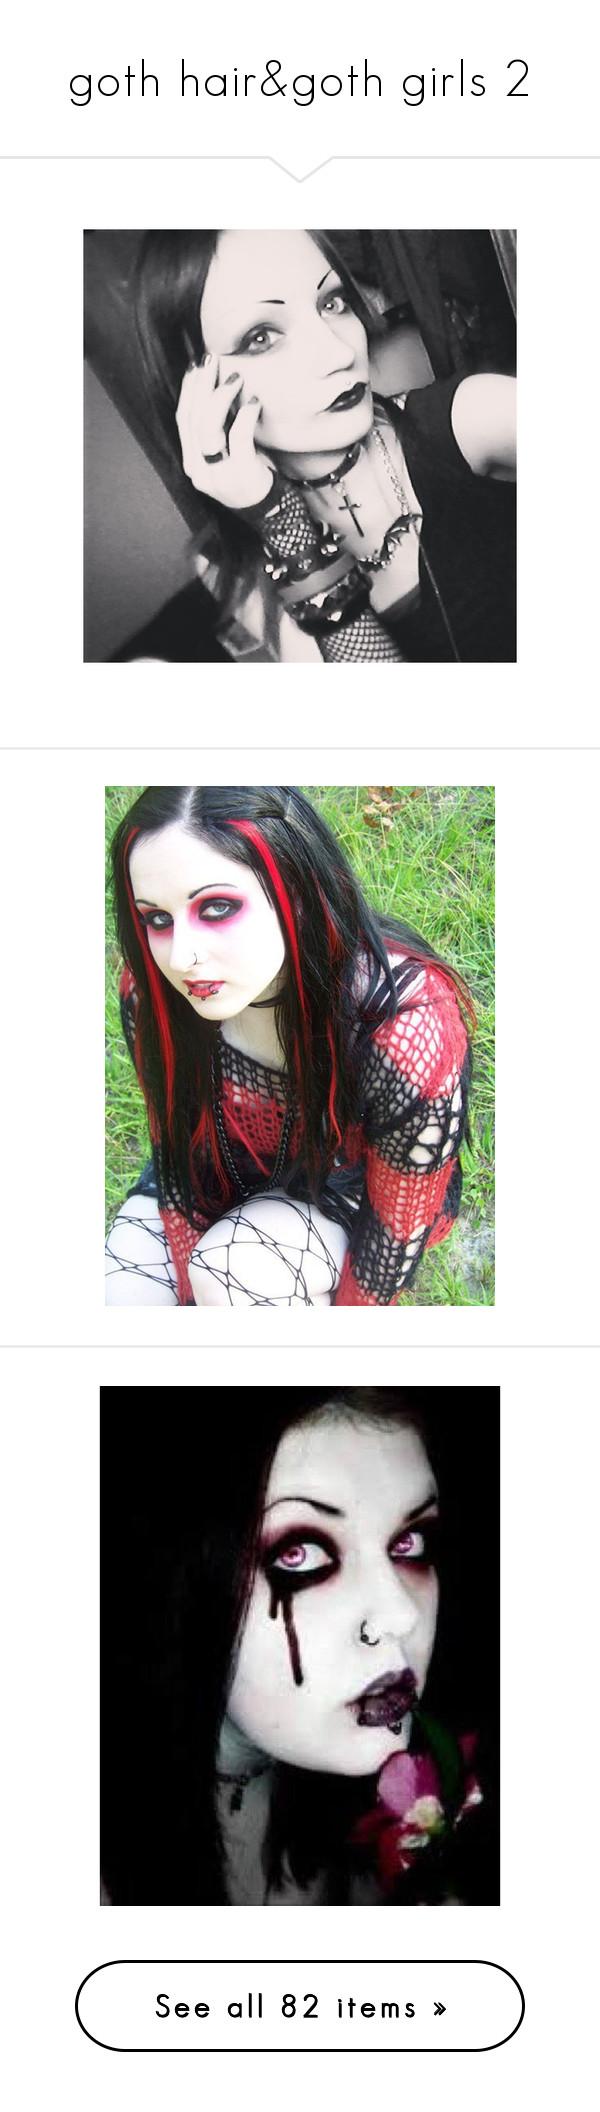 Goth hairugoth girls